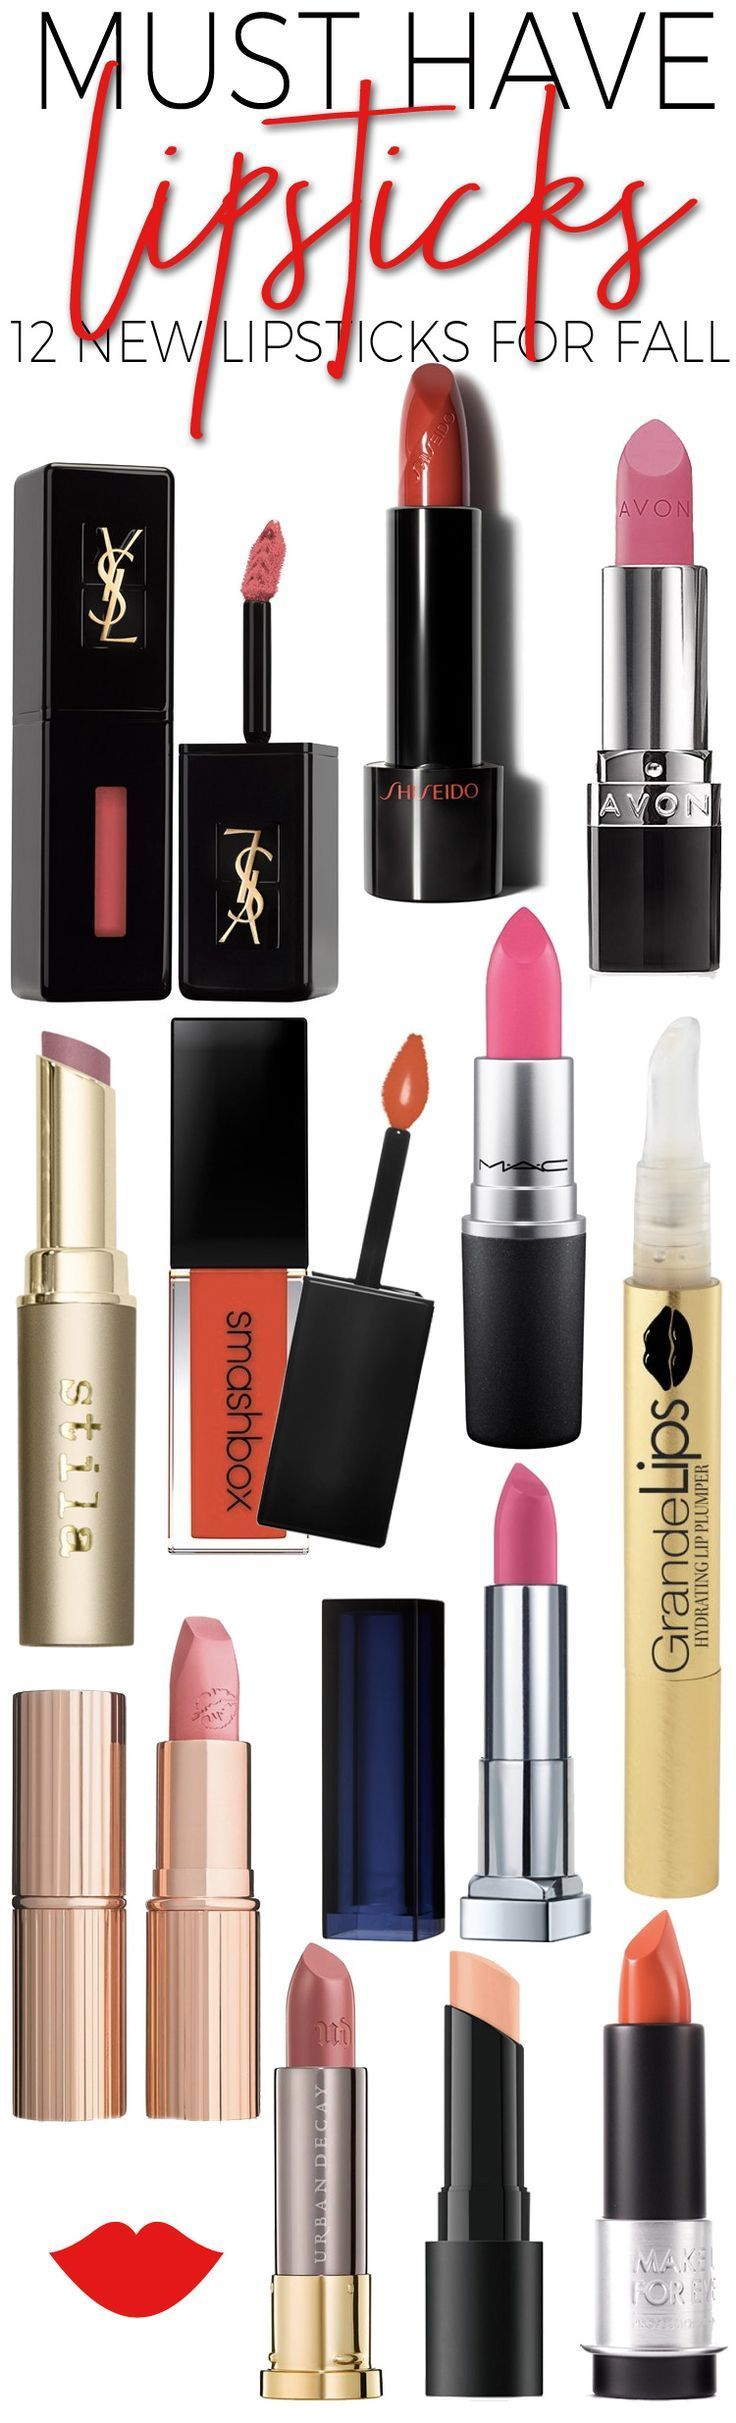 National Lipstick Day: 12 Best New Lipsticks -  National Lipstick Day: 12 Best New Lipsticks. –